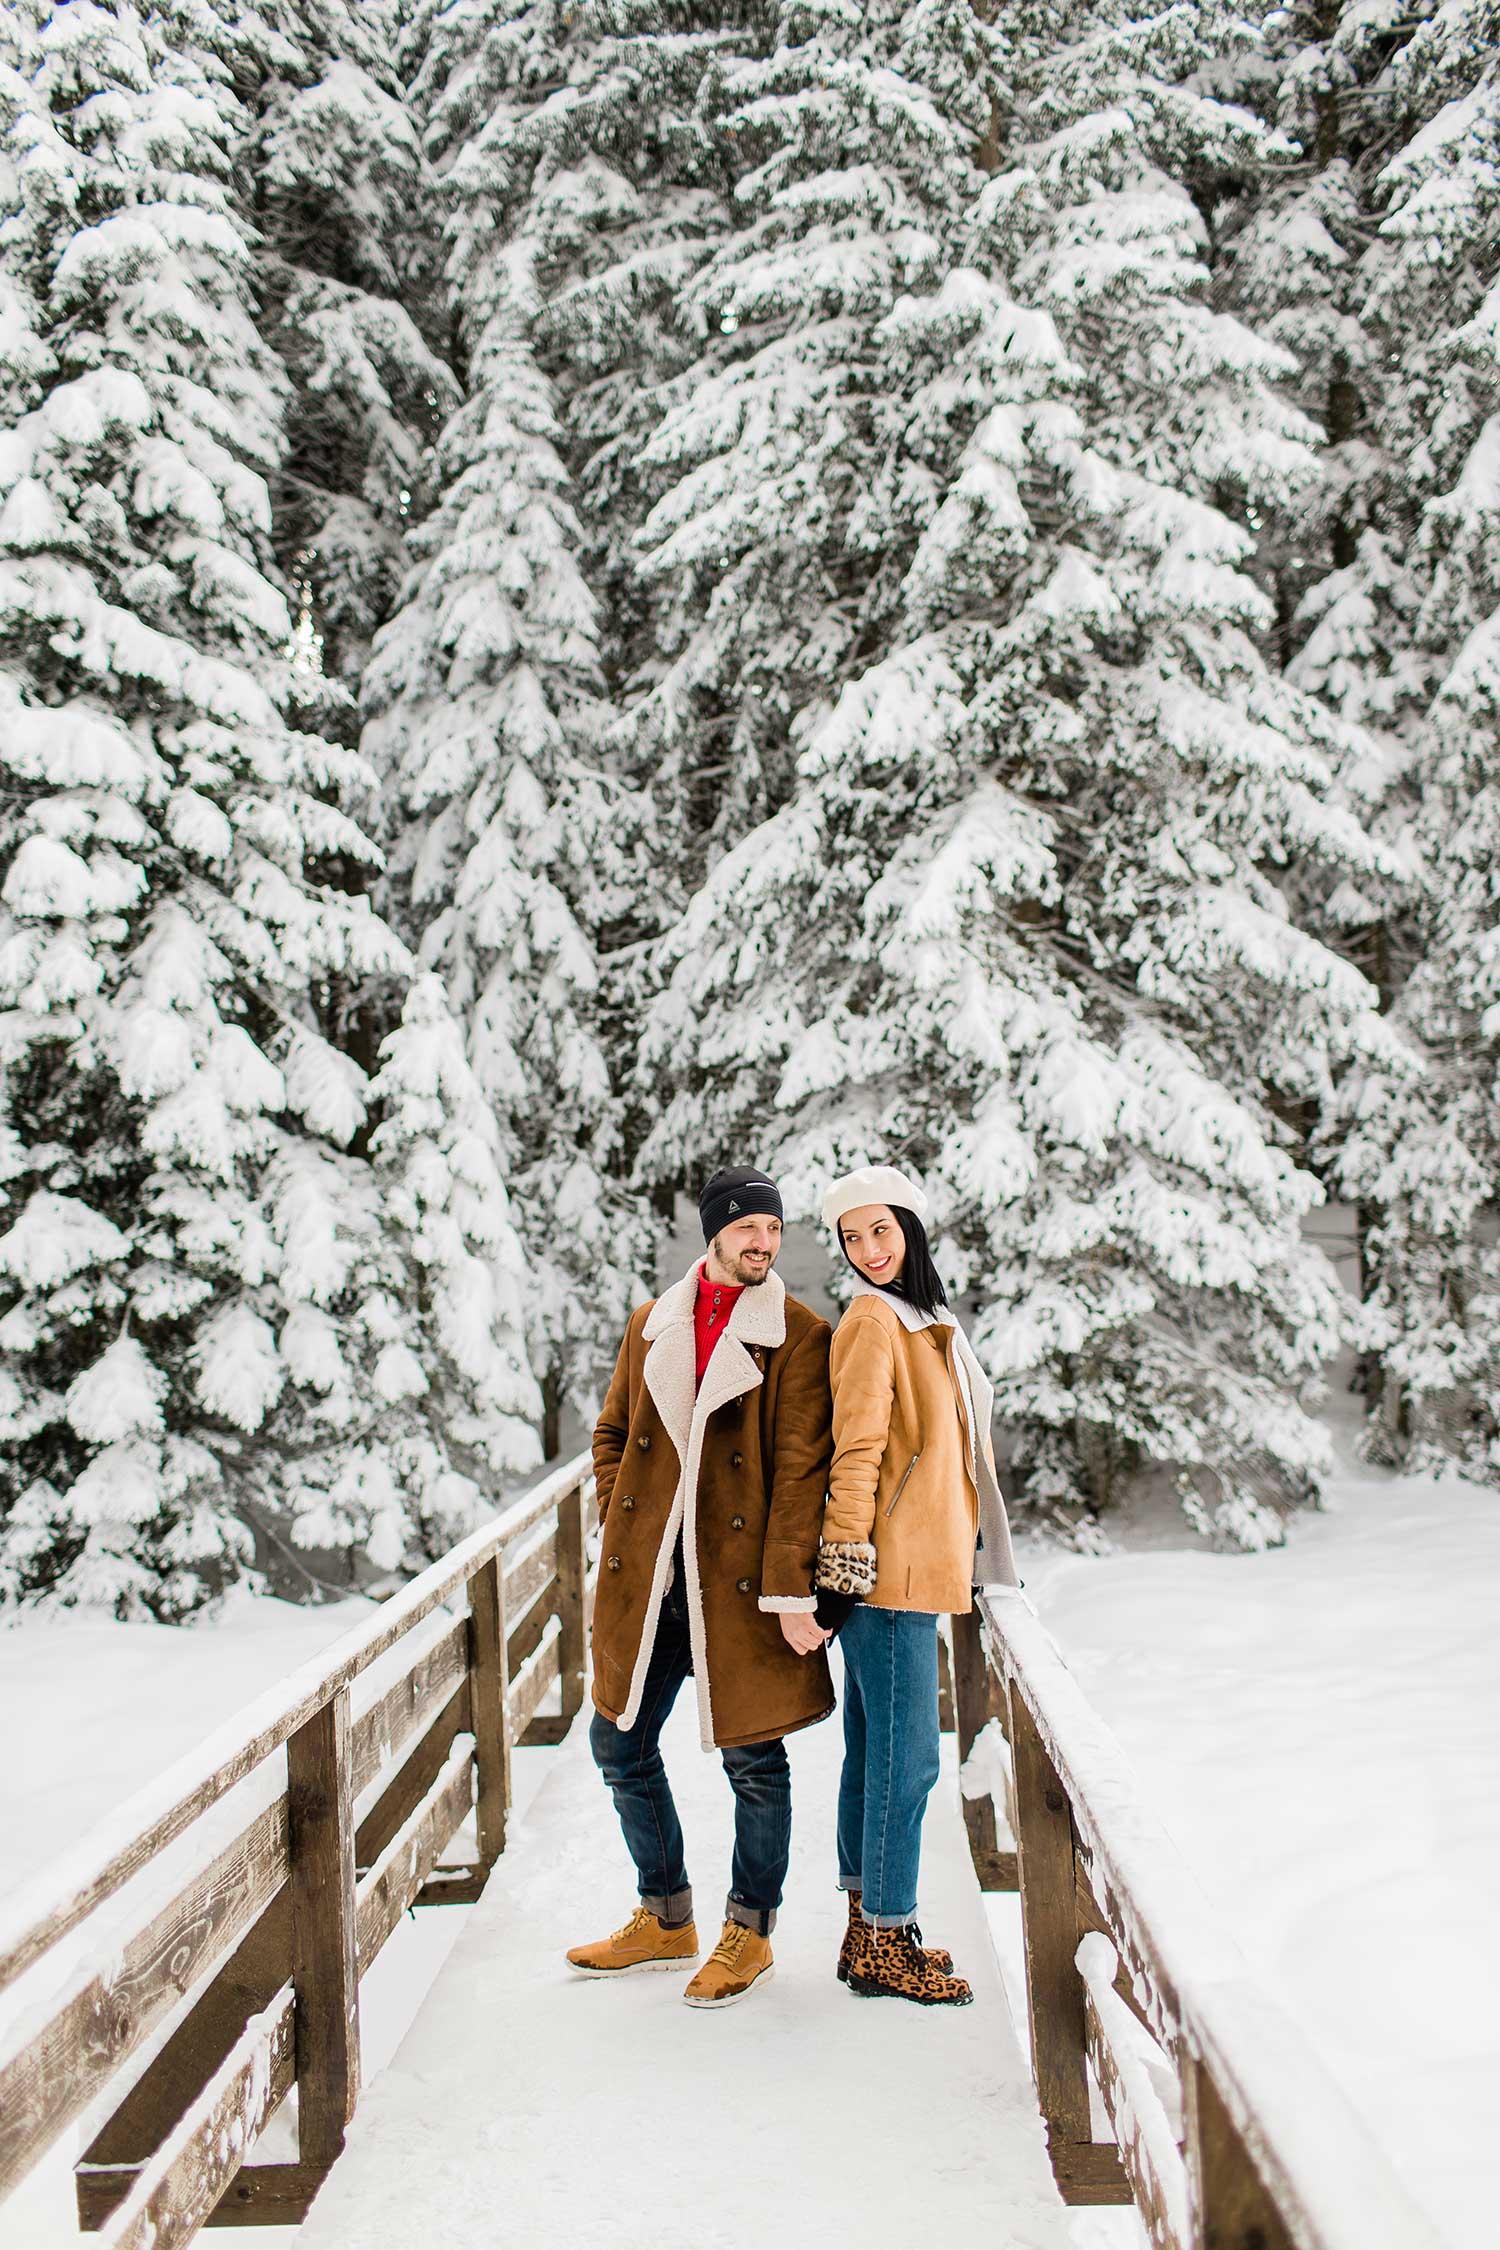 Couple in love posing in winter